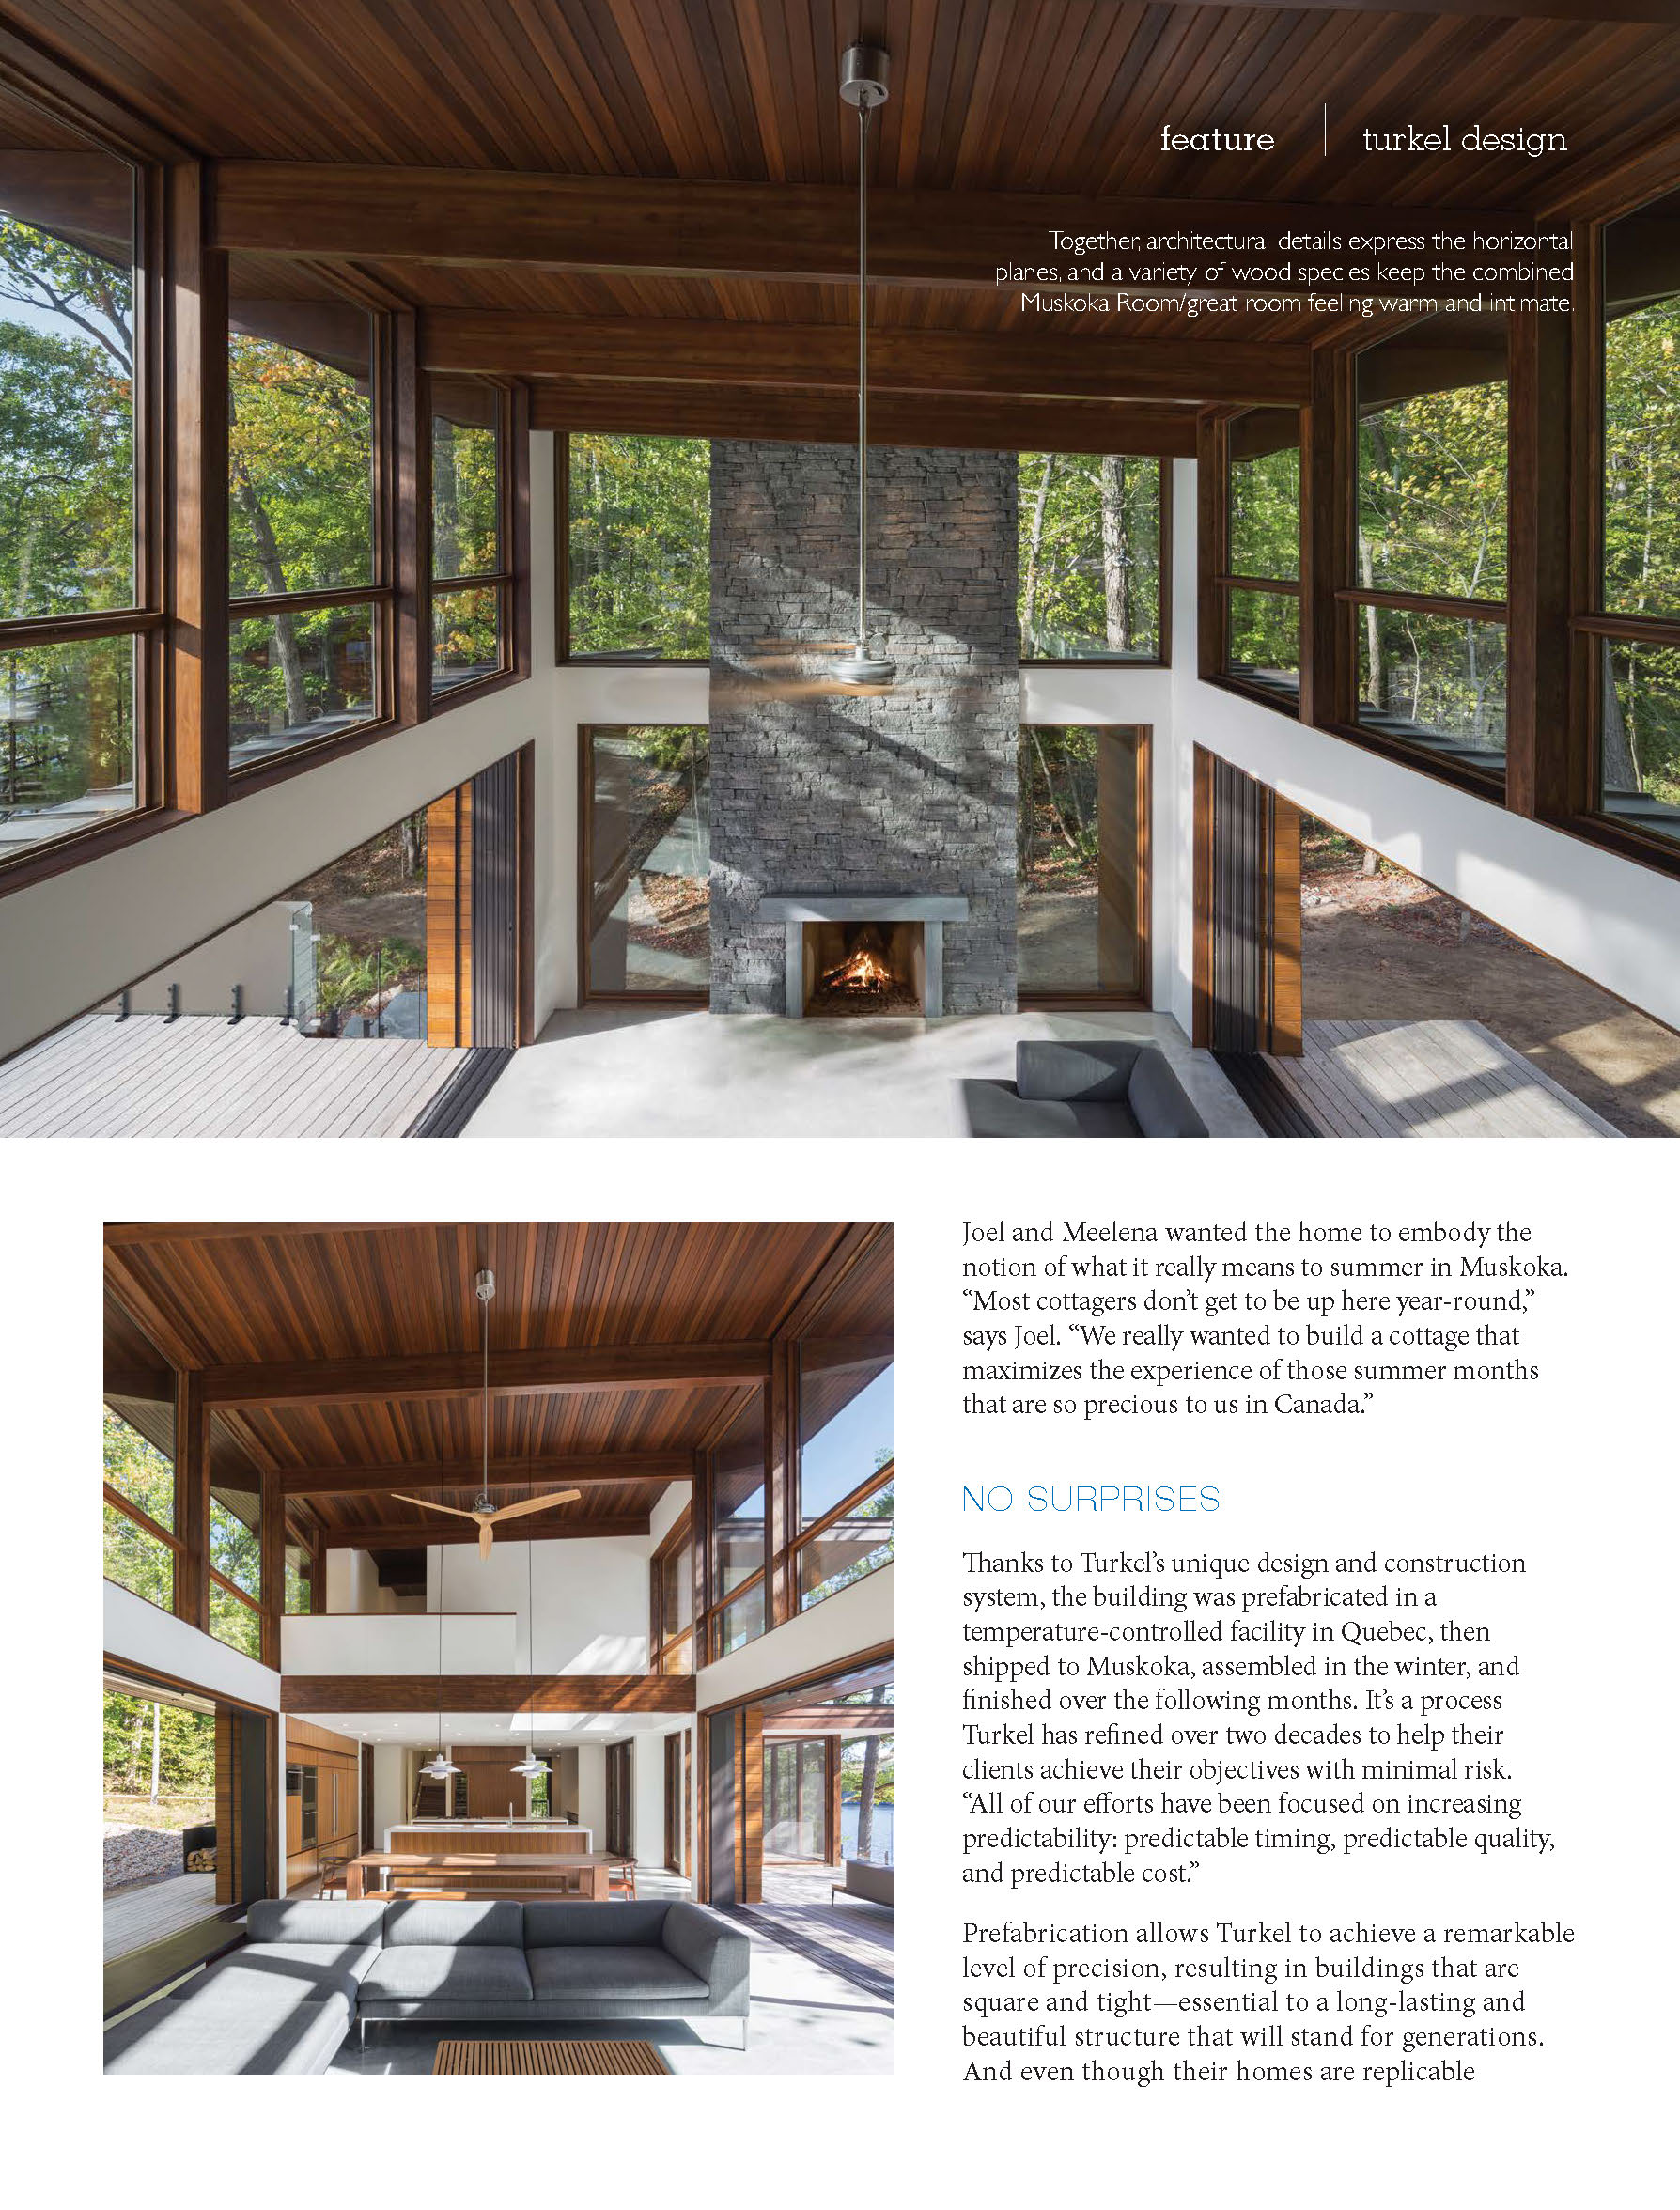 turkel_design_modern_prefab_home_muskoka_hideaways_Page_3.jpg